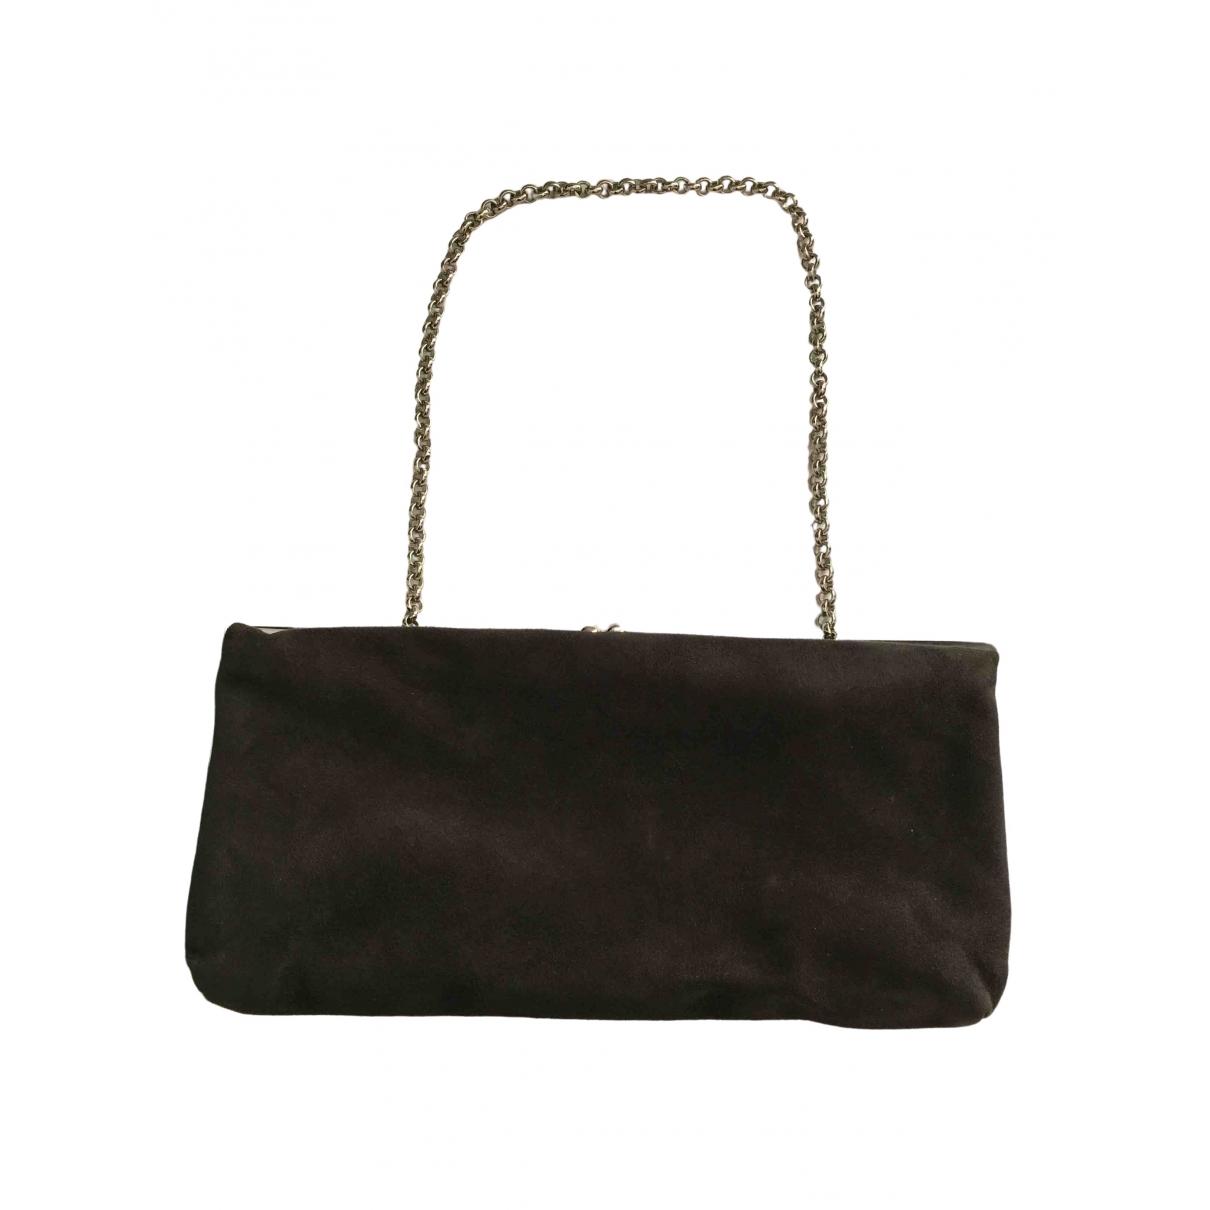 Dolce & Gabbana \N Anthracite Suede Clutch bag for Women \N